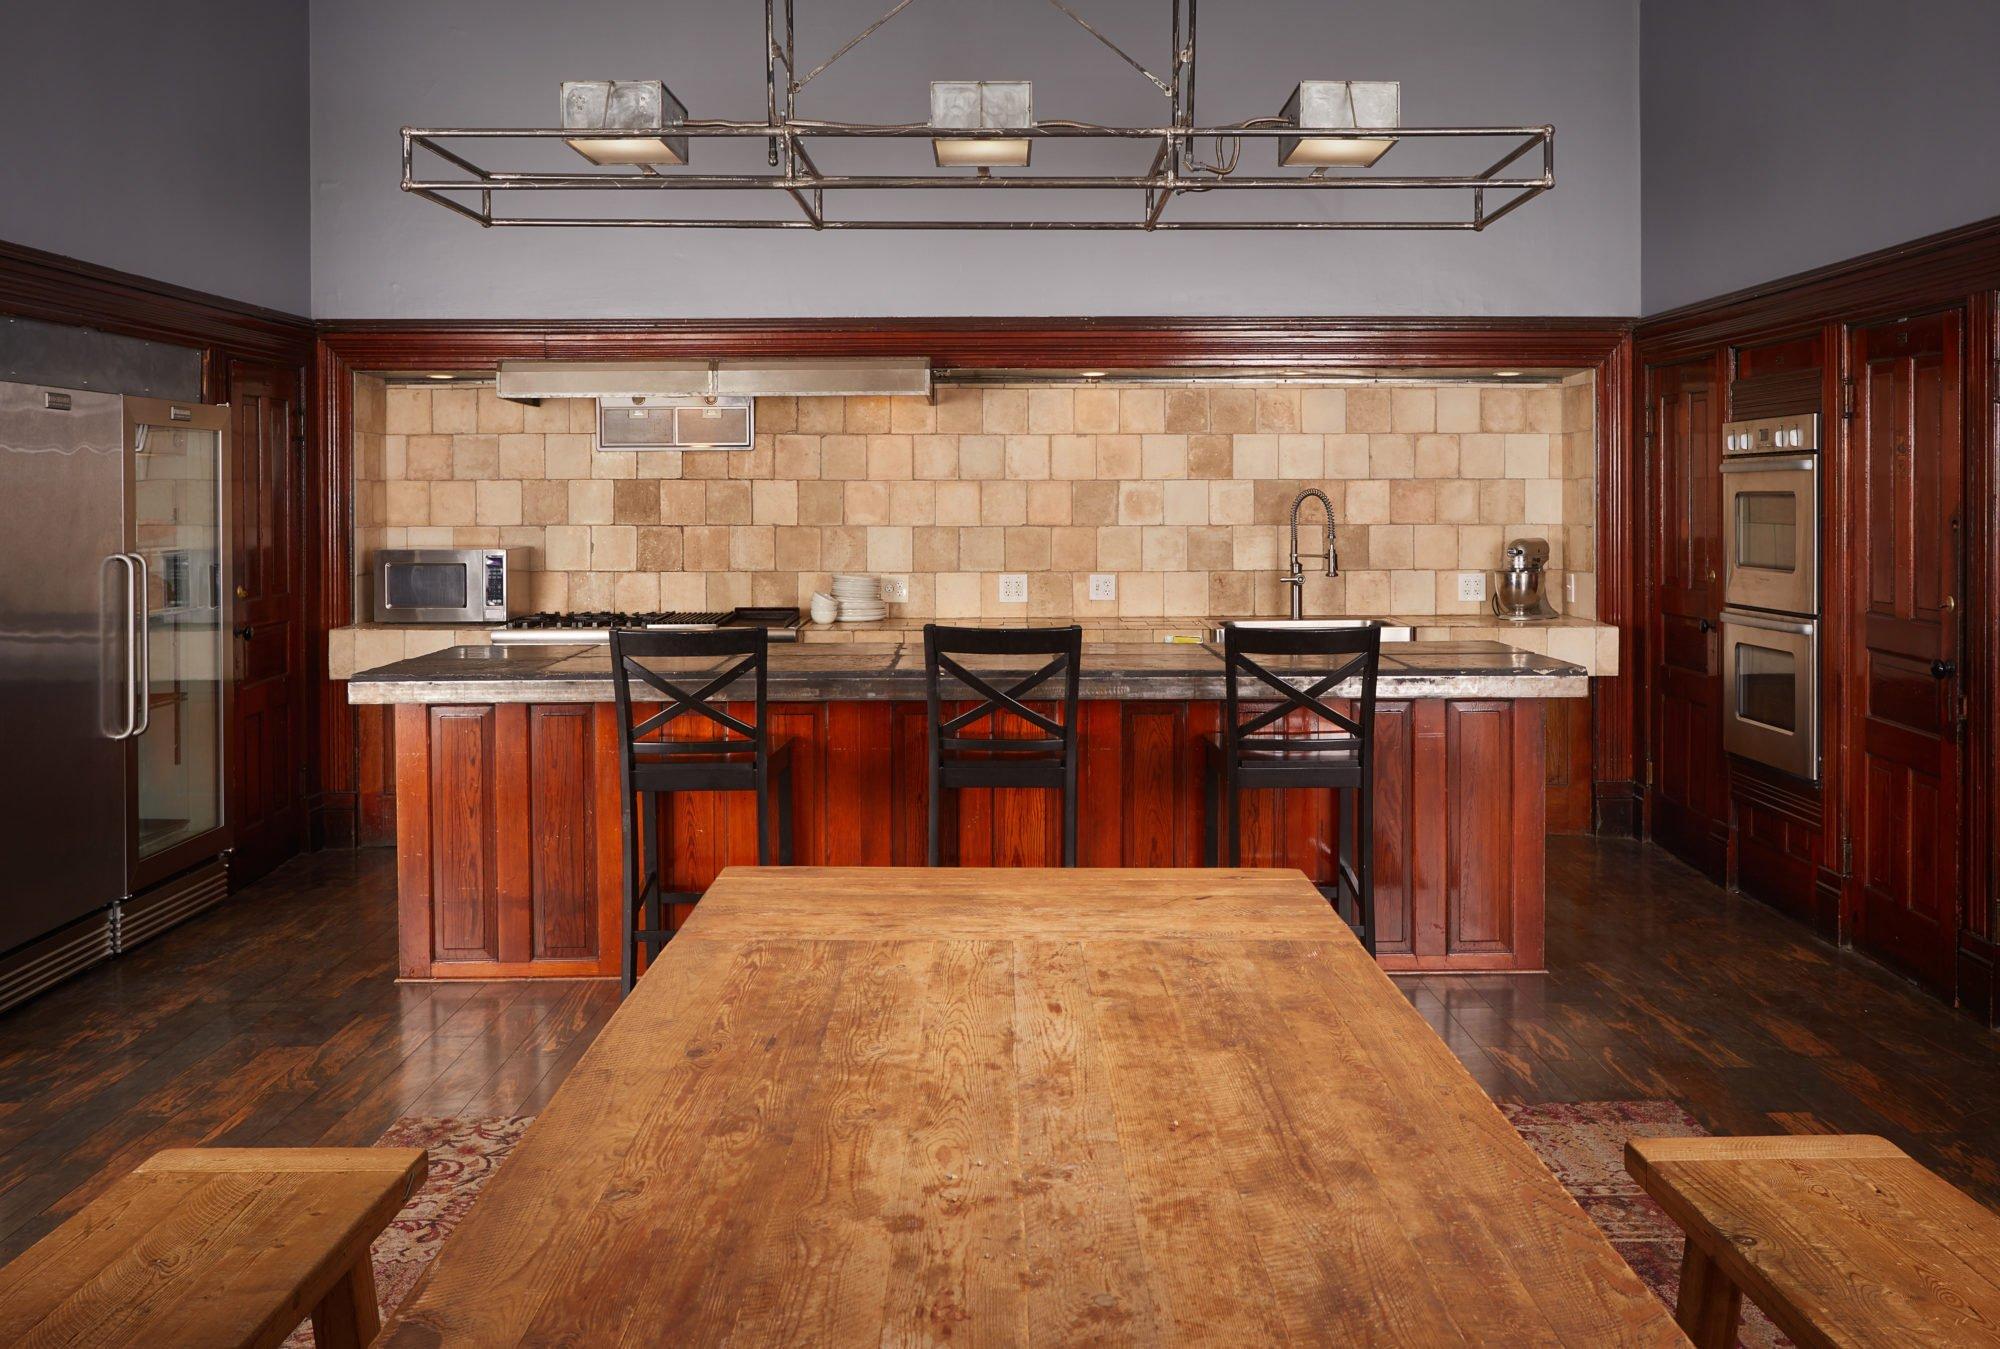 Second Floor Photo Studio Kitchen